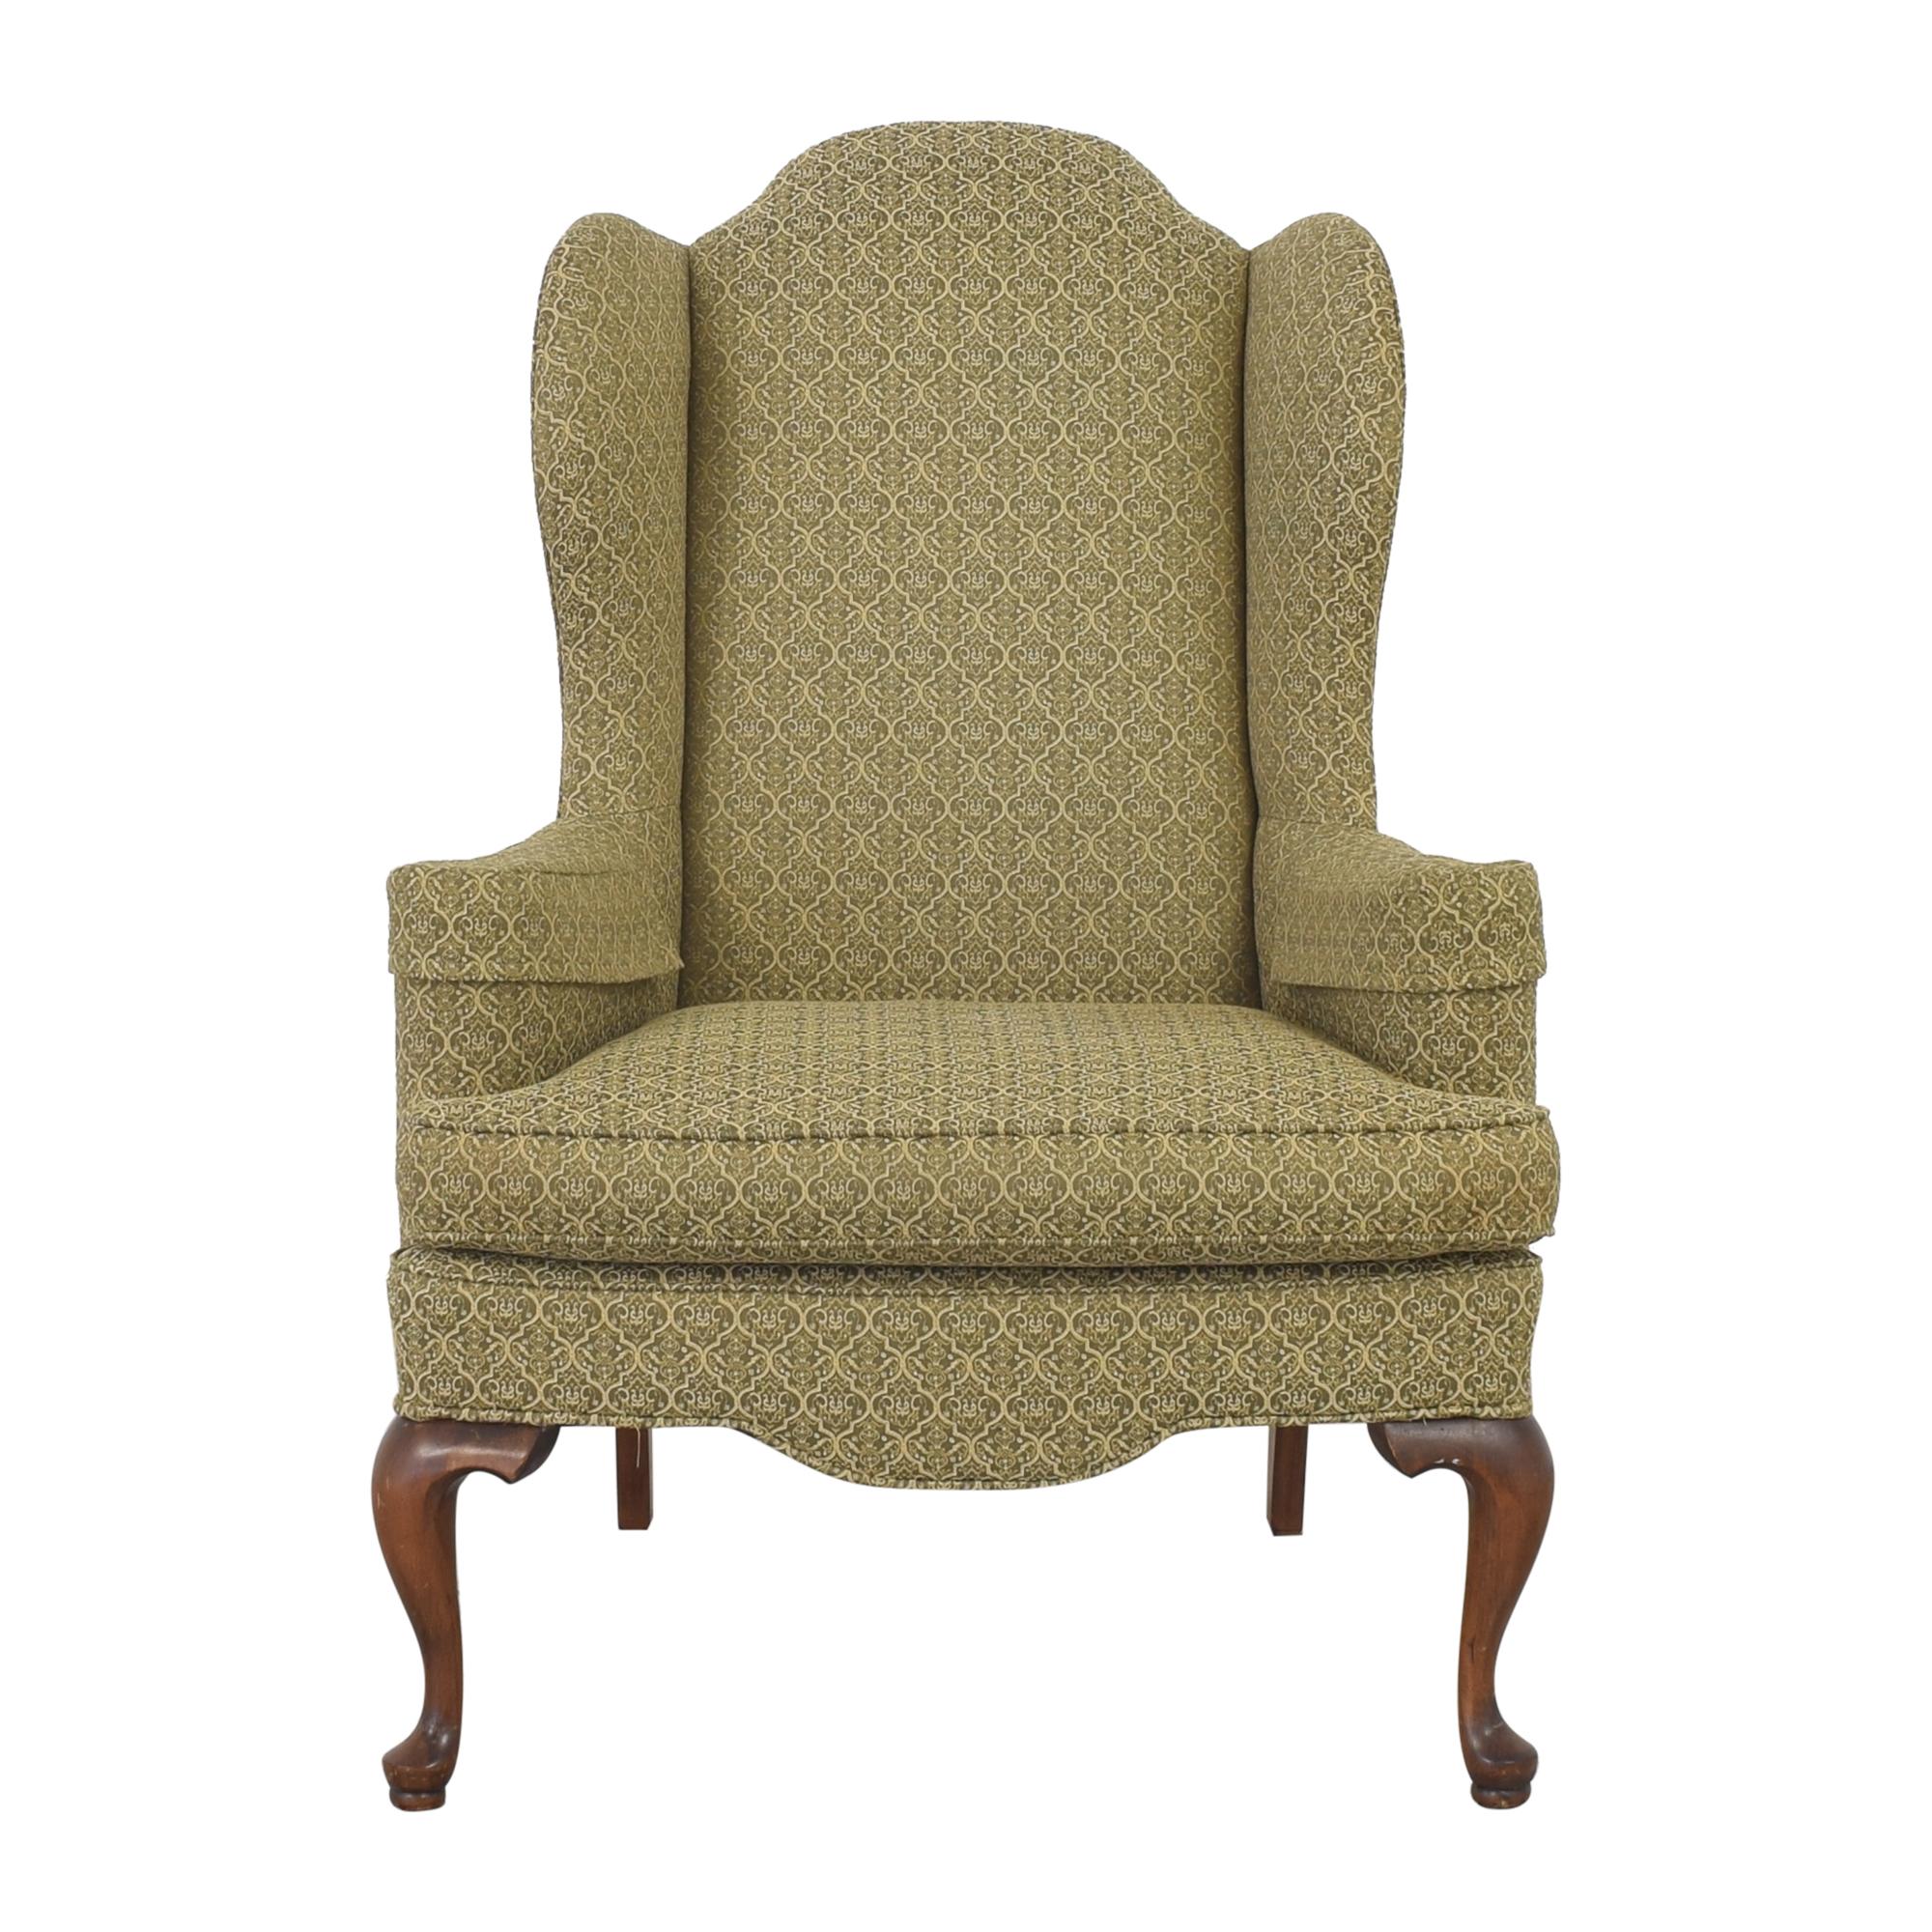 Ethan Allen Ethan Allen Queen Anne Wing Chair ct